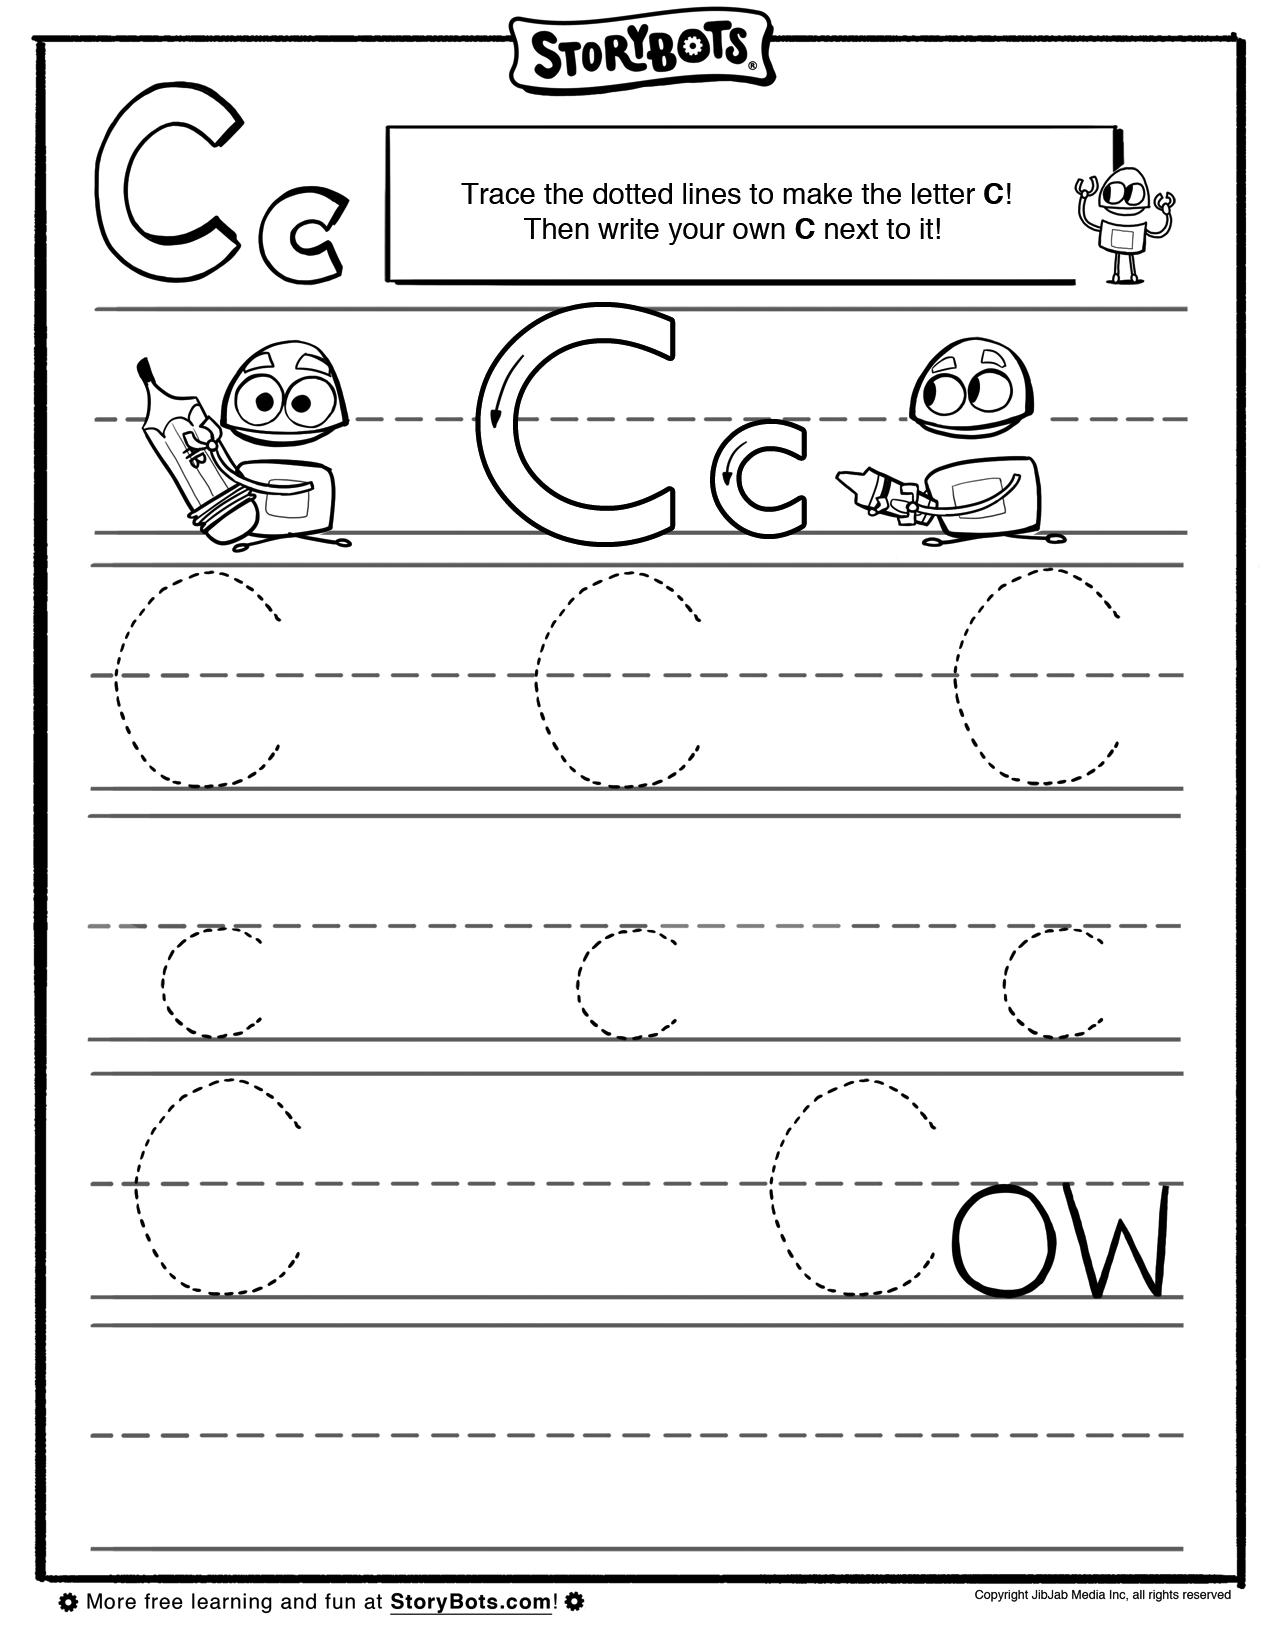 Letter C Tracing Sheet Abc Activity Sheets Storybots Preschool Tracing Kindergarten Worksheets Kindergarten Math Worksheets [ 1650 x 1275 Pixel ]